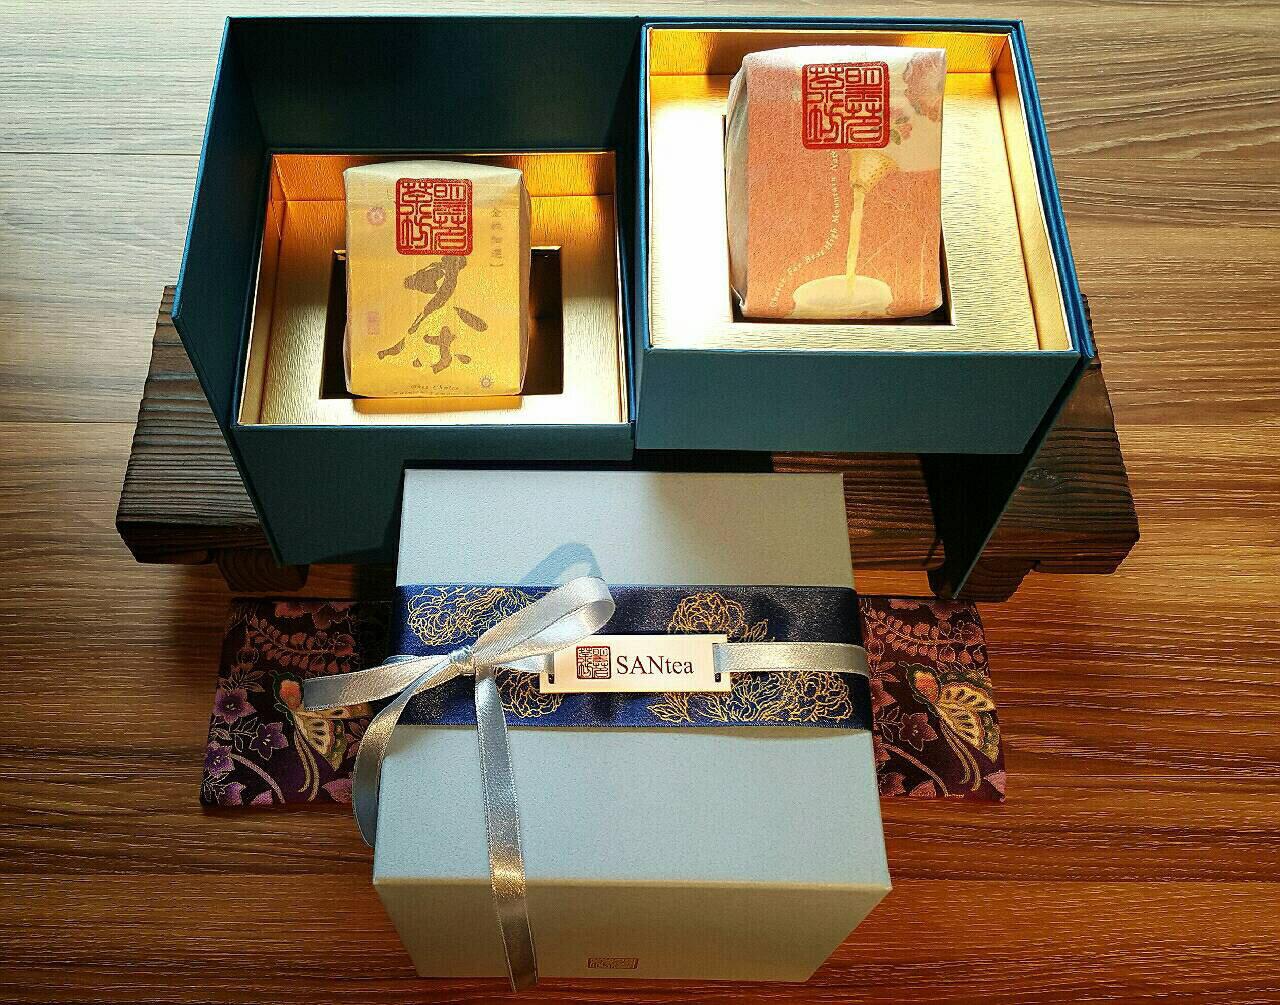 <br/><br/>  台灣鹿谷20年老茶半斤(300g)+獨家設計純手工茶葉精緻禮盒*1<br/><br/>